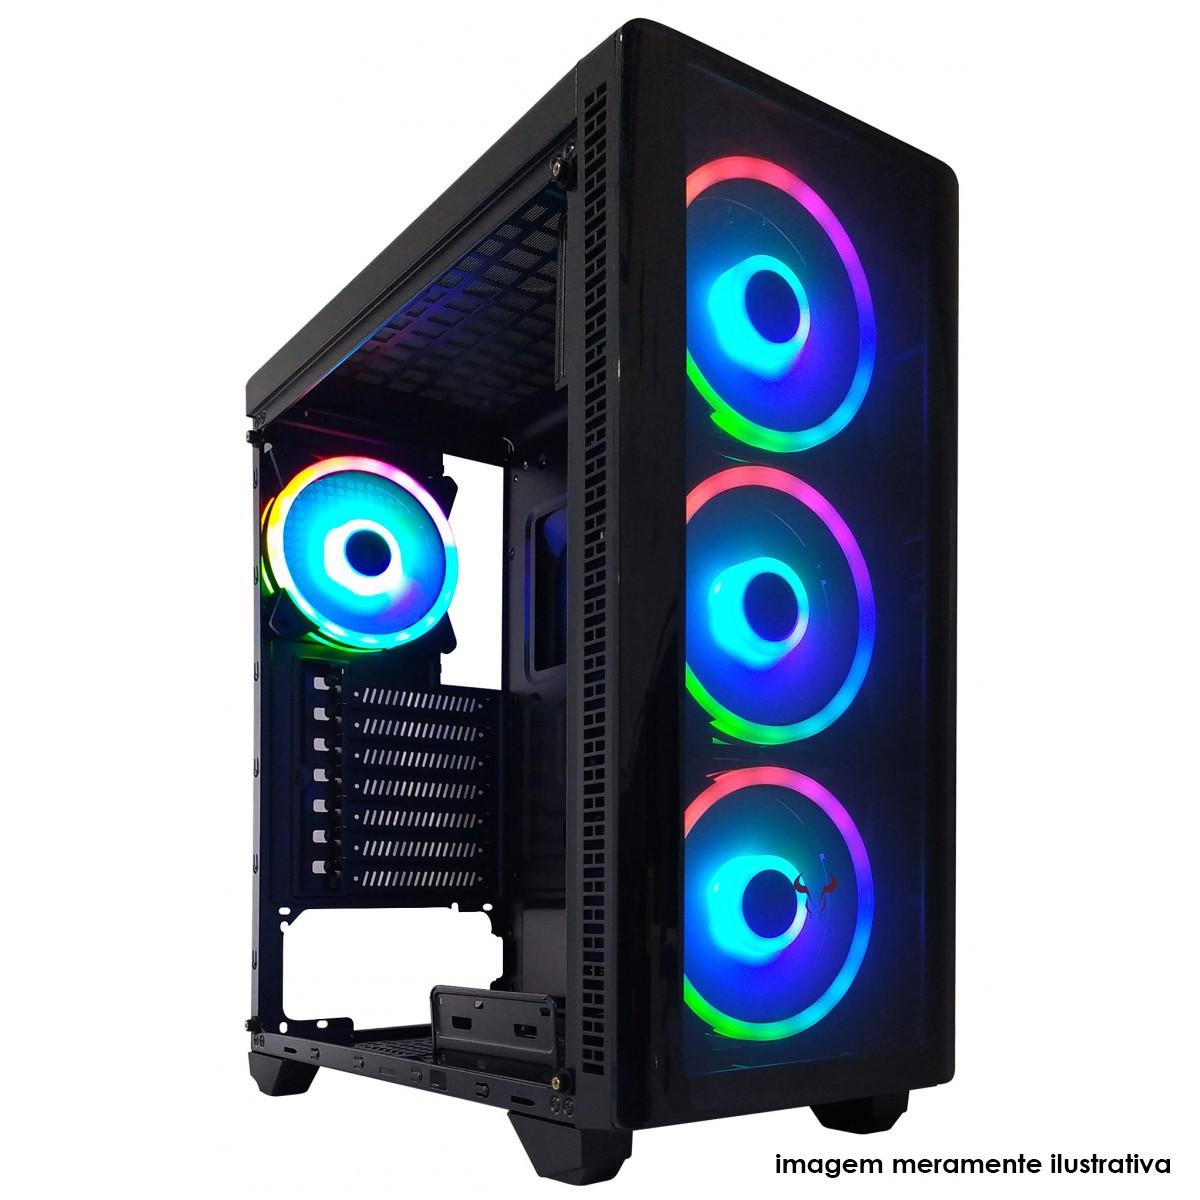 PC Gamer T-Moba Furious LVL-1 AMD Athlon / Nvidia GeForce / 8GB DDR4 / HD 1TB